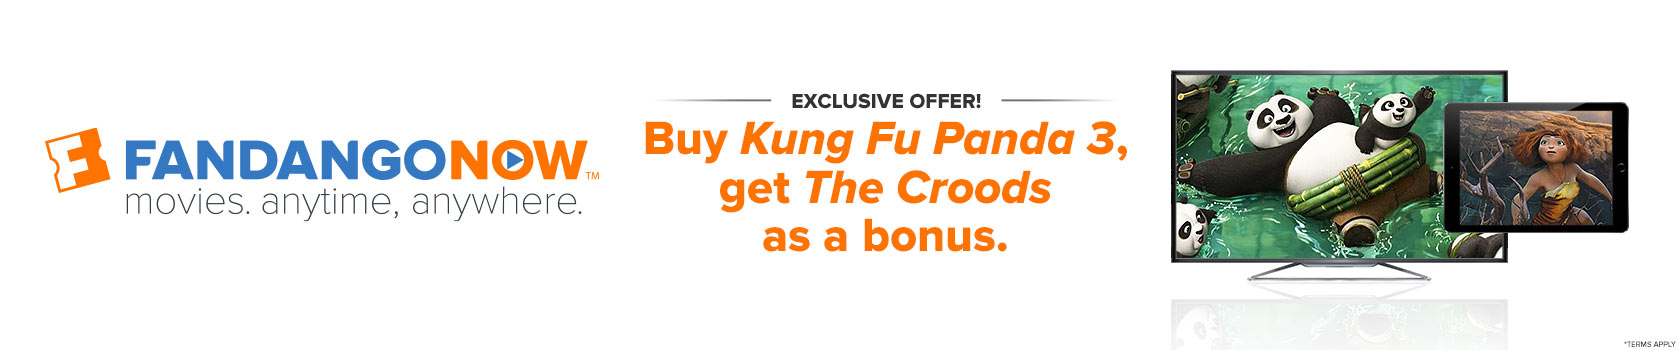 FandangoNOW Kung Fu Panda 3